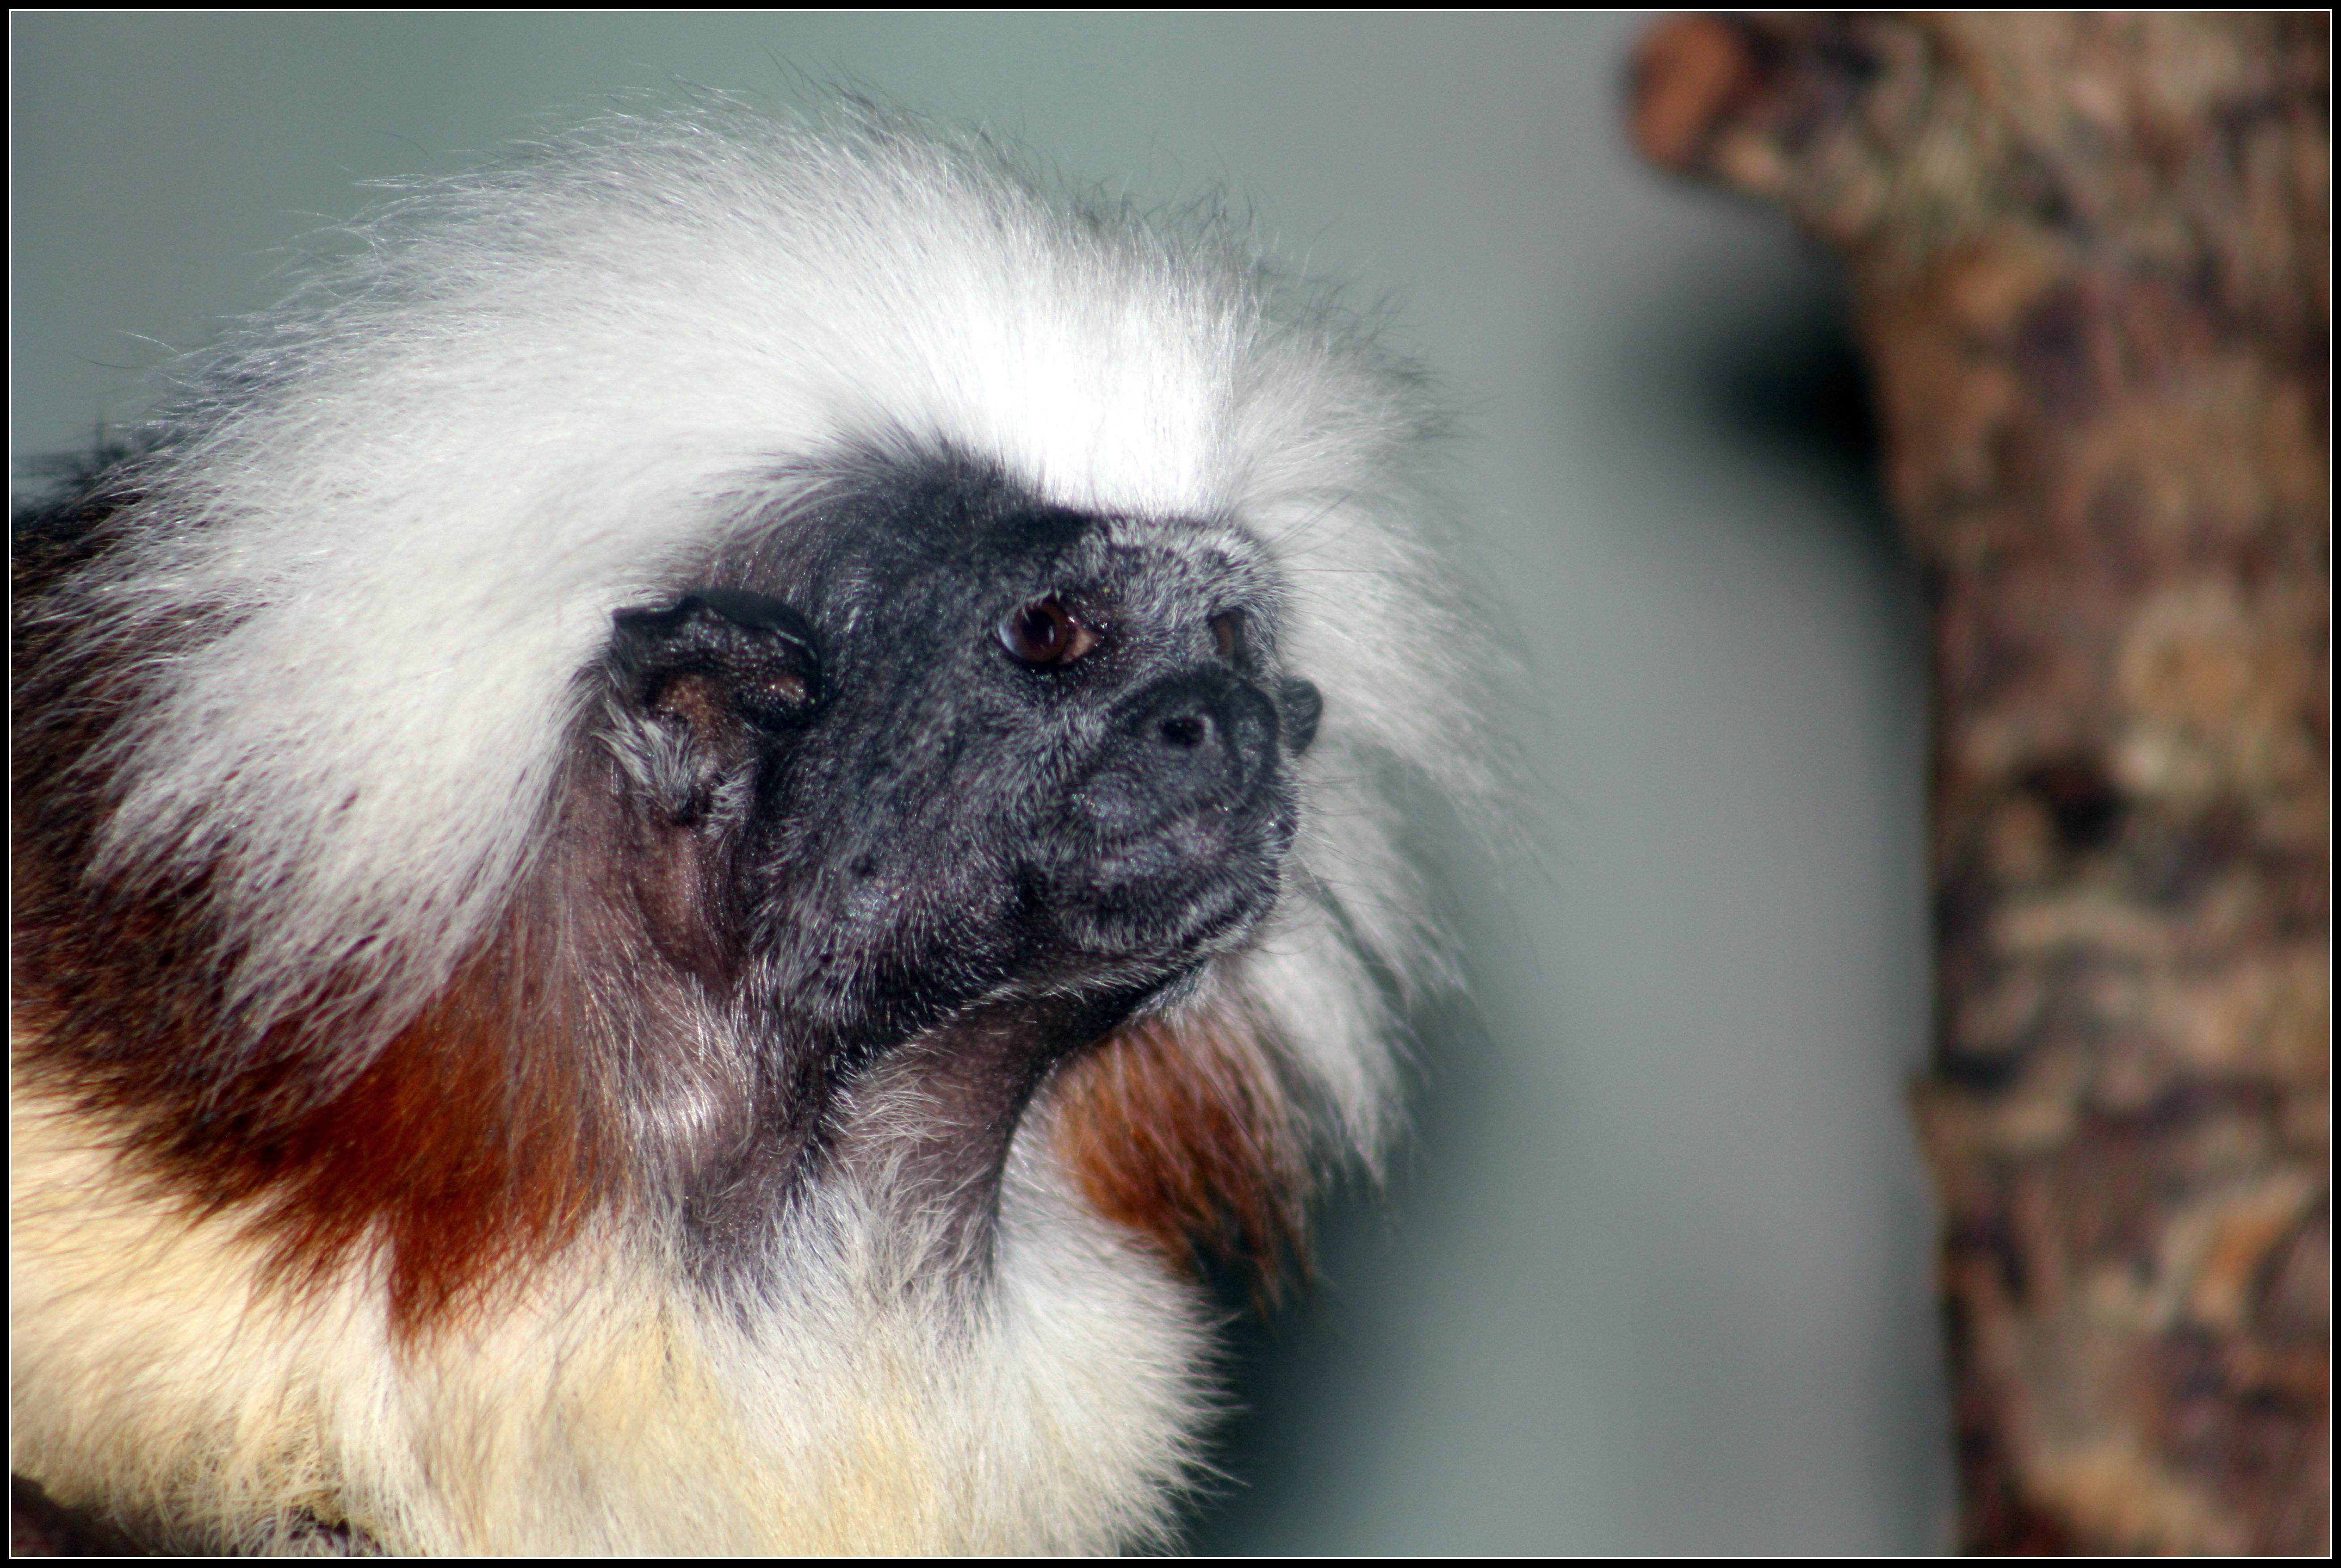 Image of cotton-top tamarin